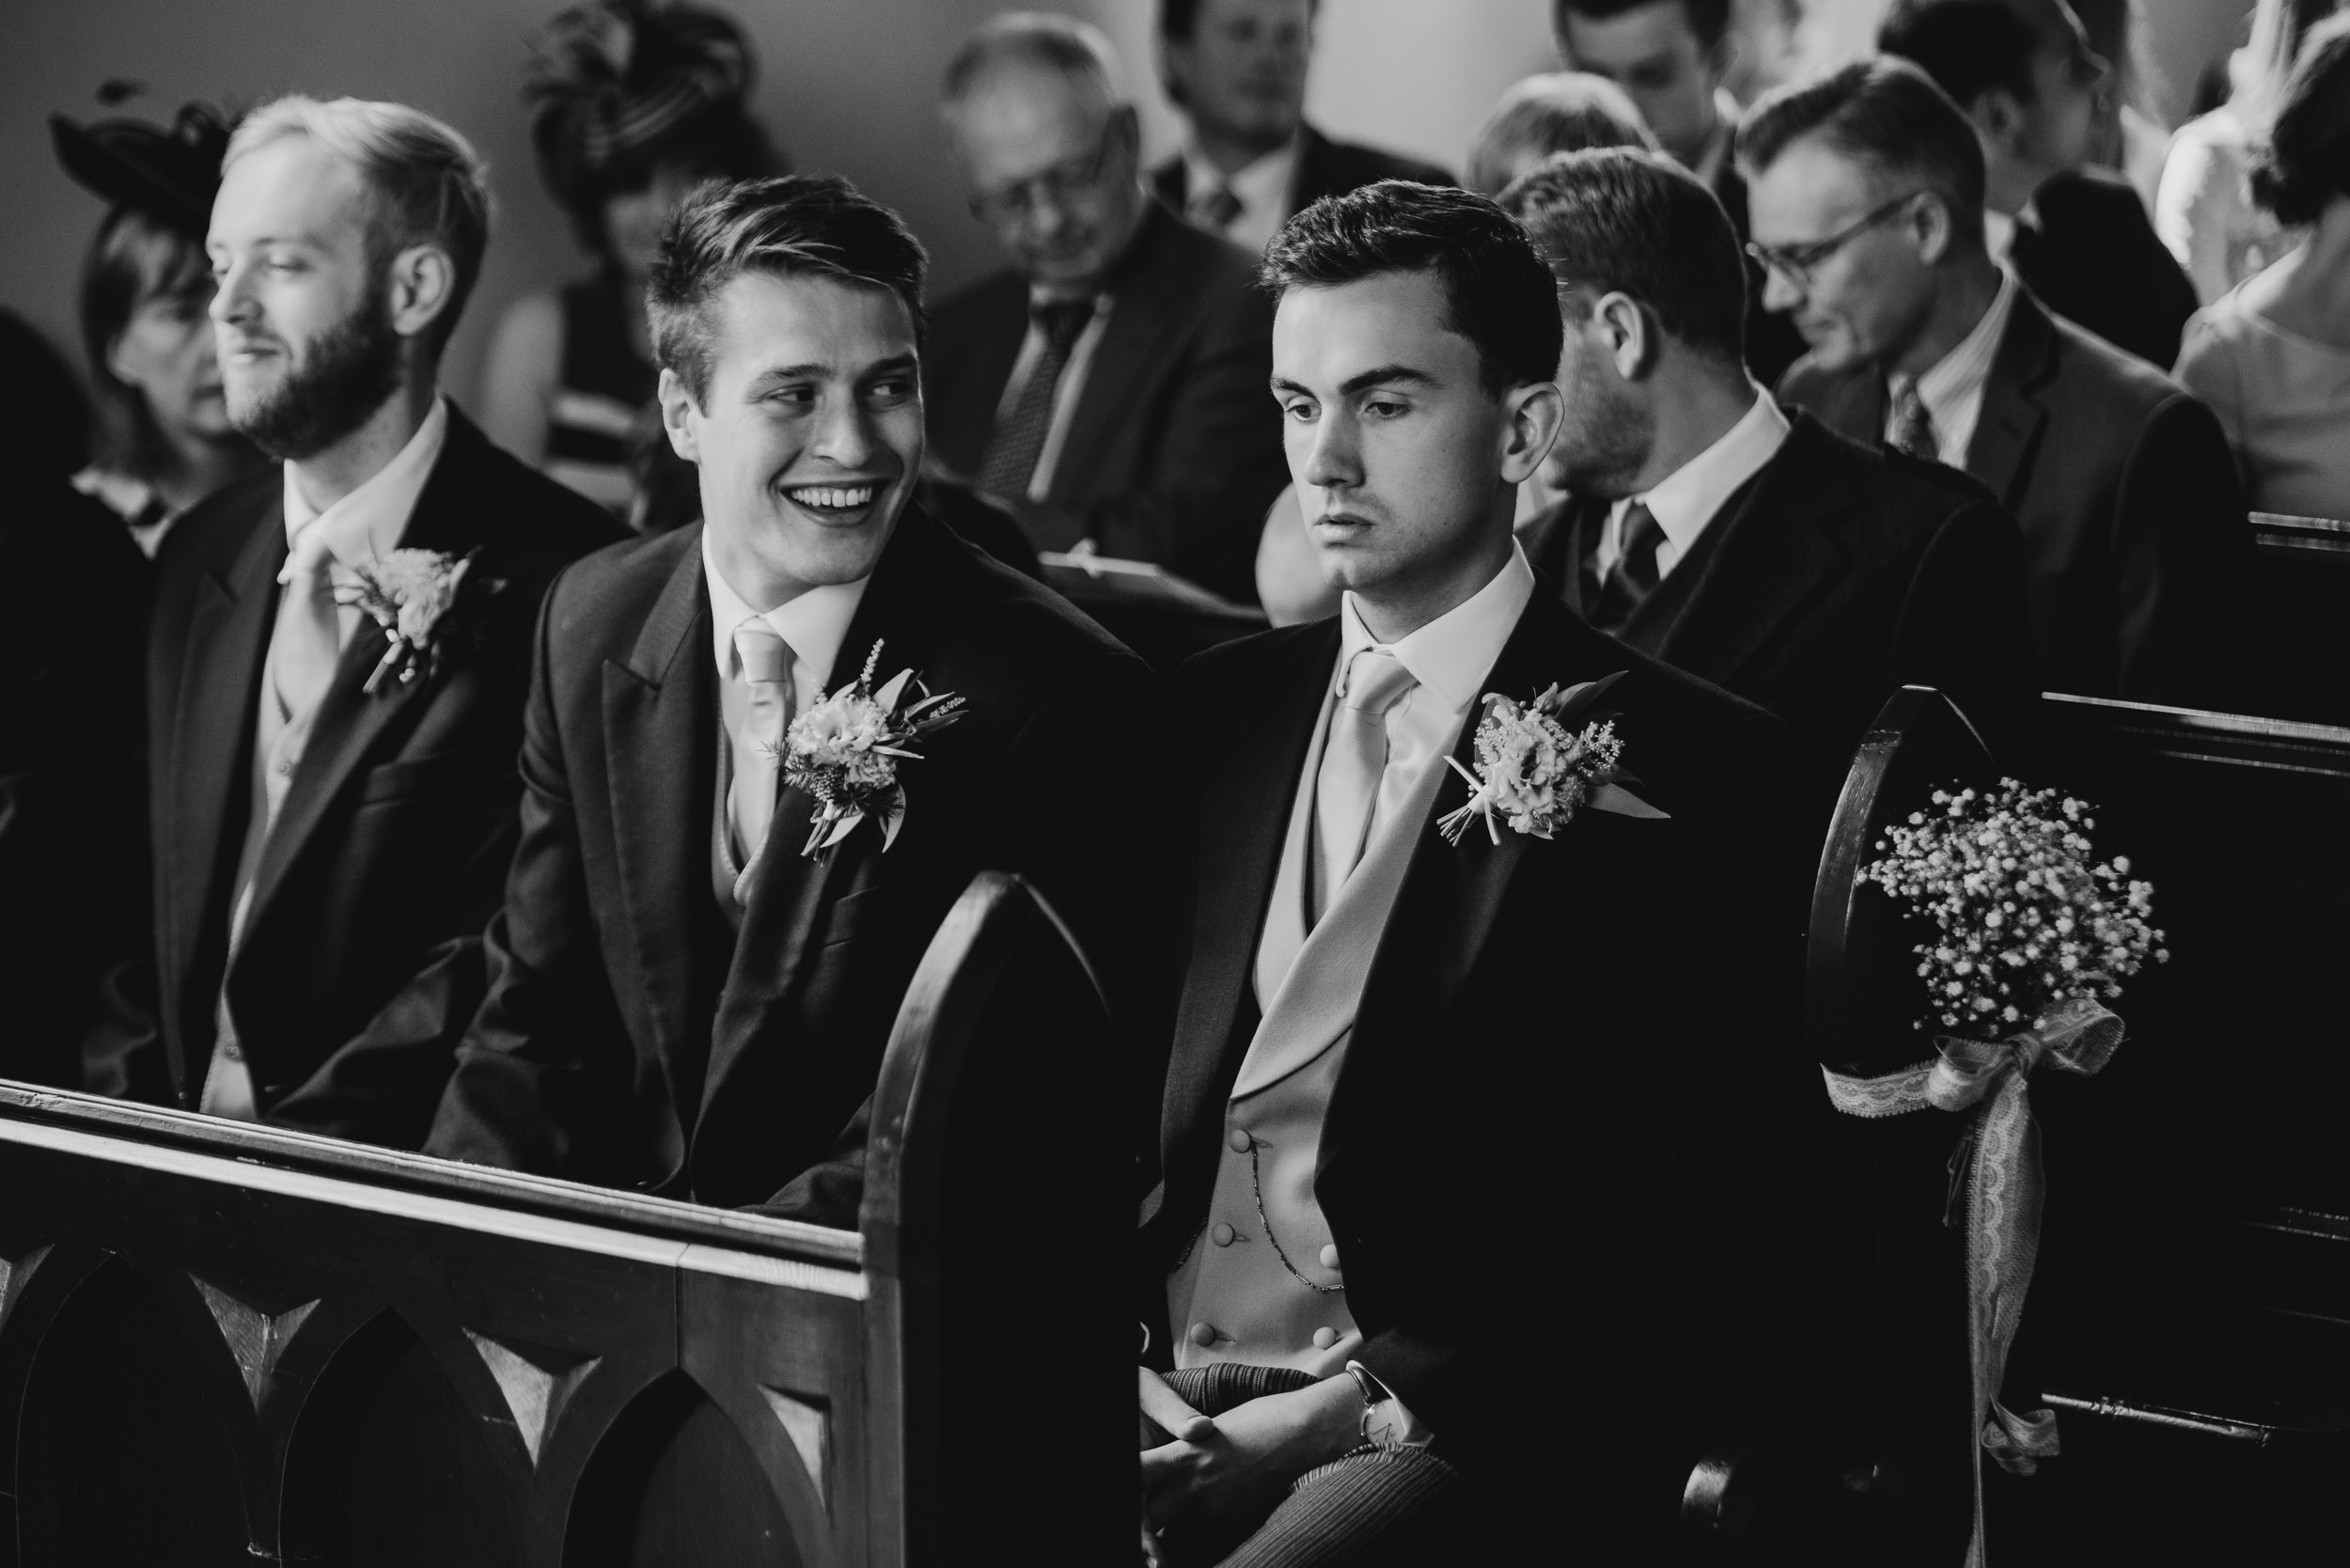 drenagh estate wedding photography-43.jpg